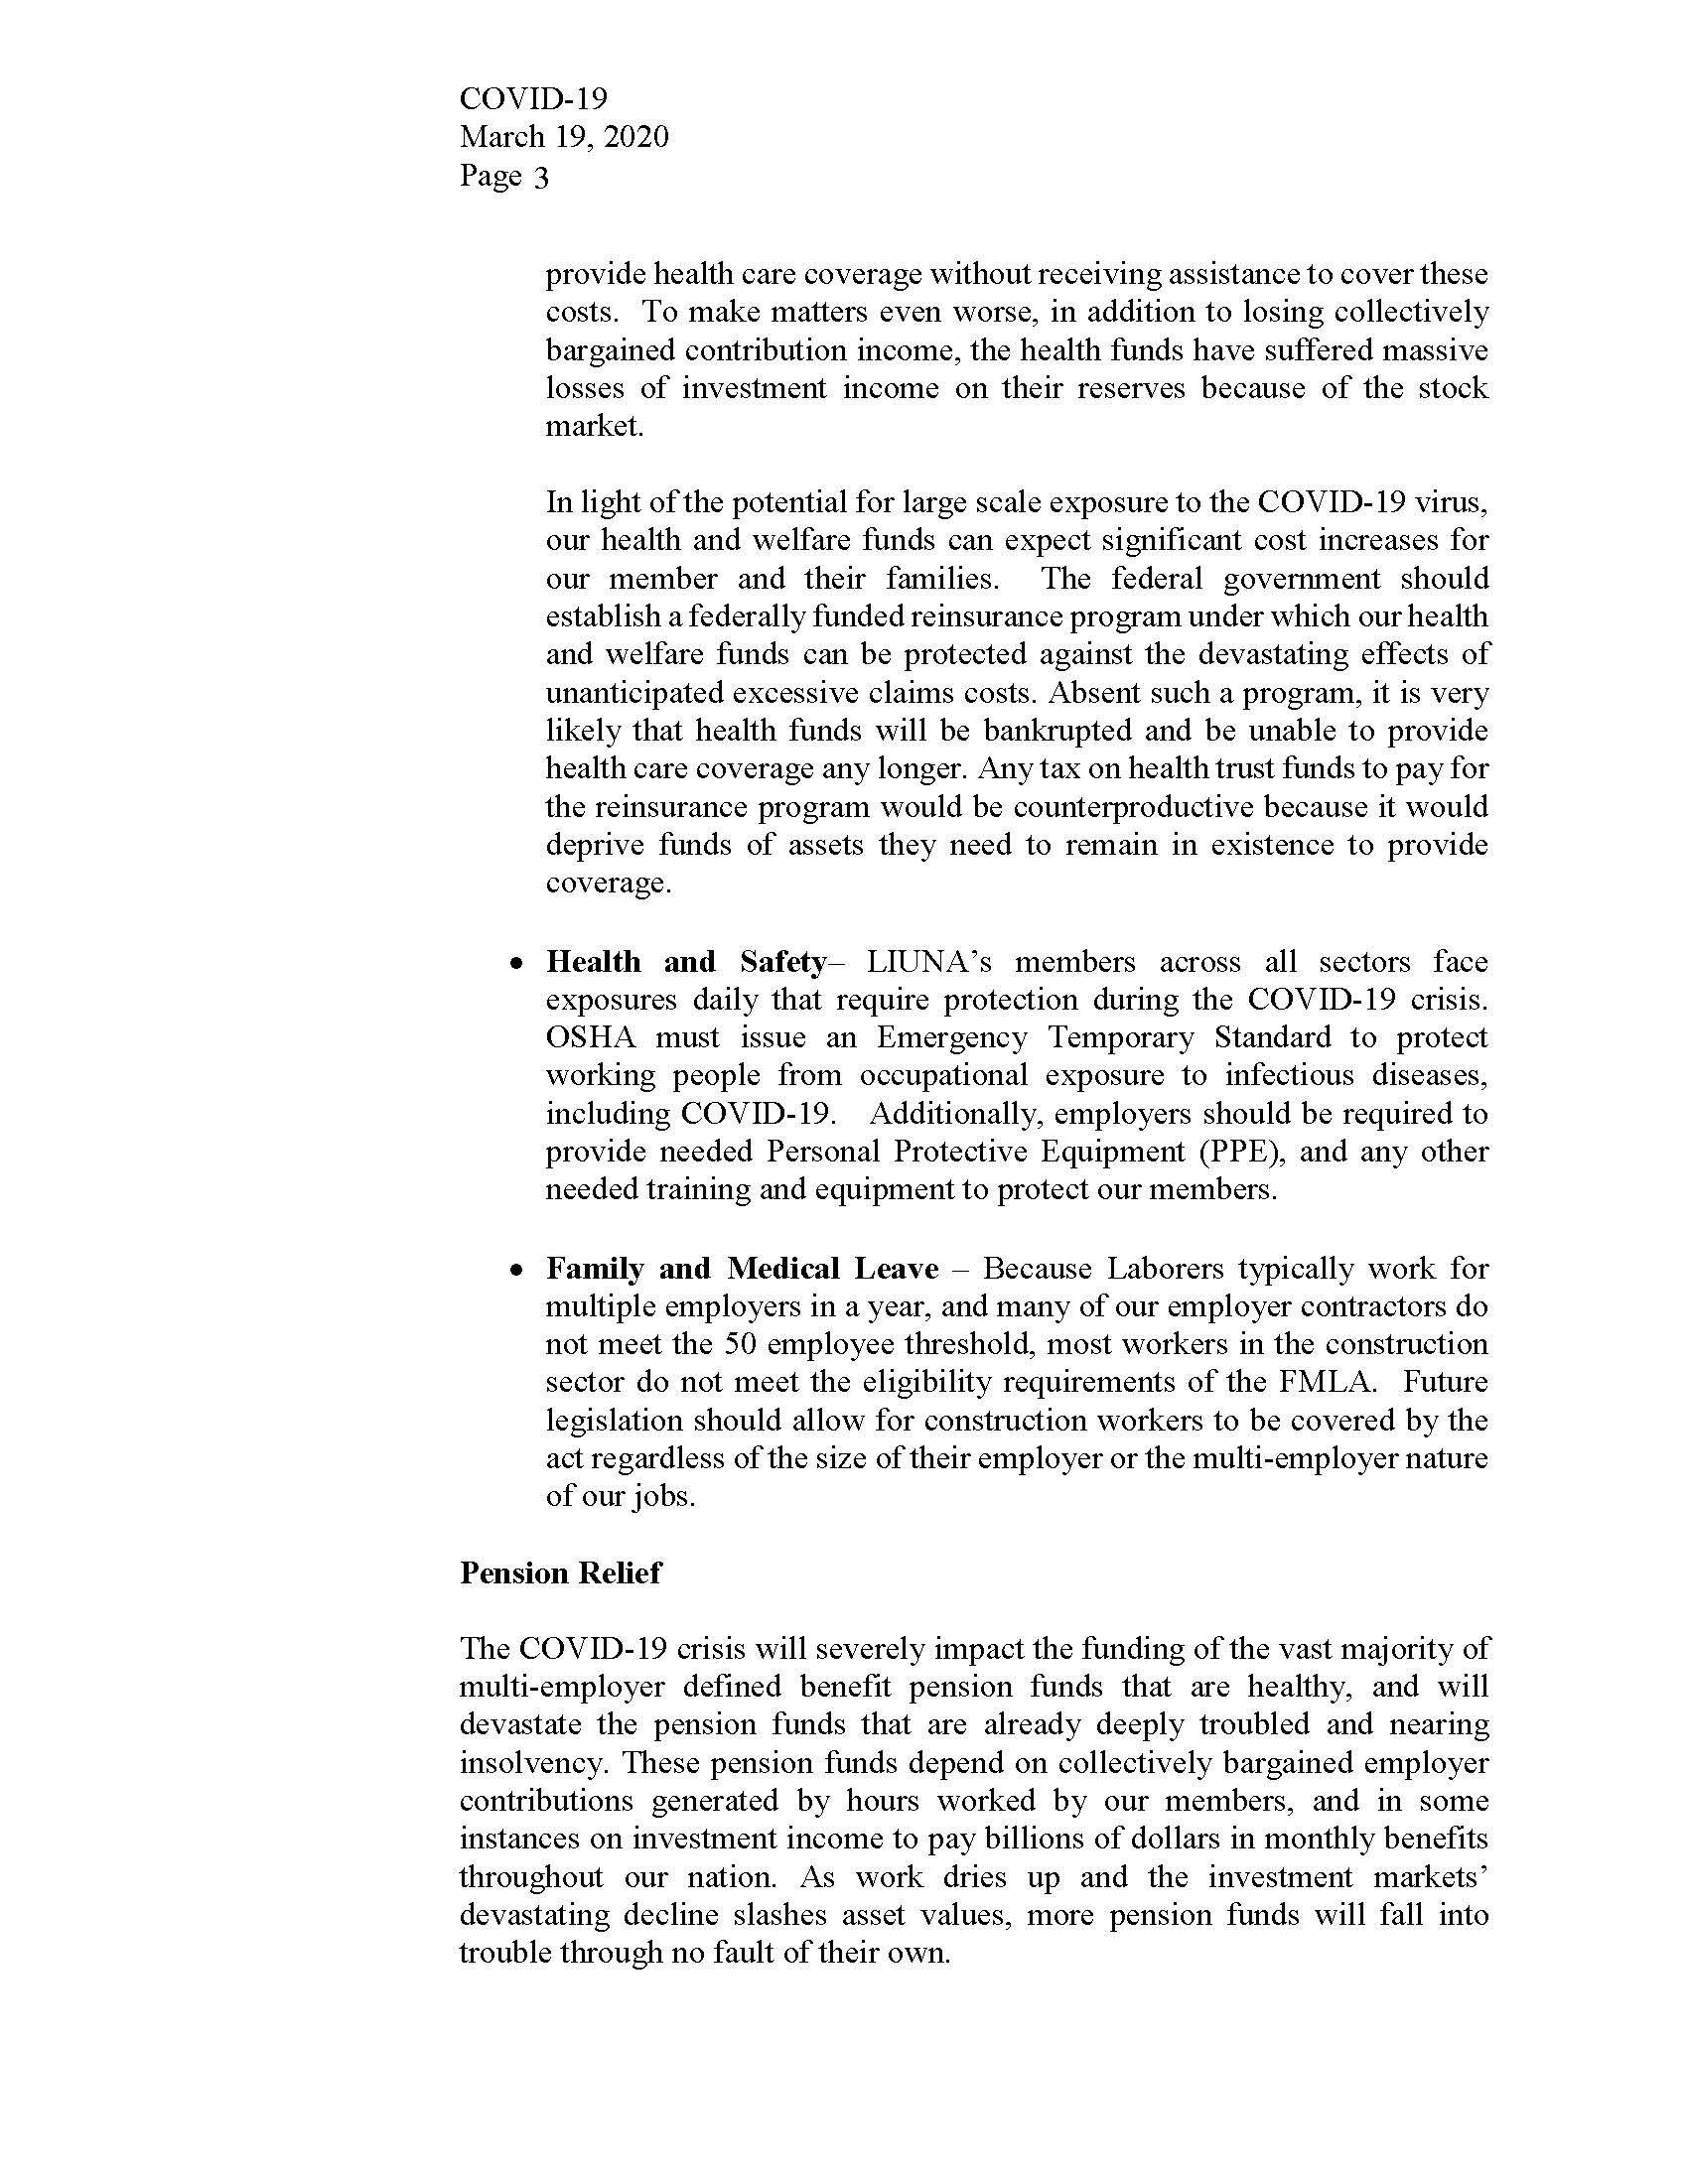 LIUNA COVID-19 March 19 2020 Final Final_Page_3.jpg